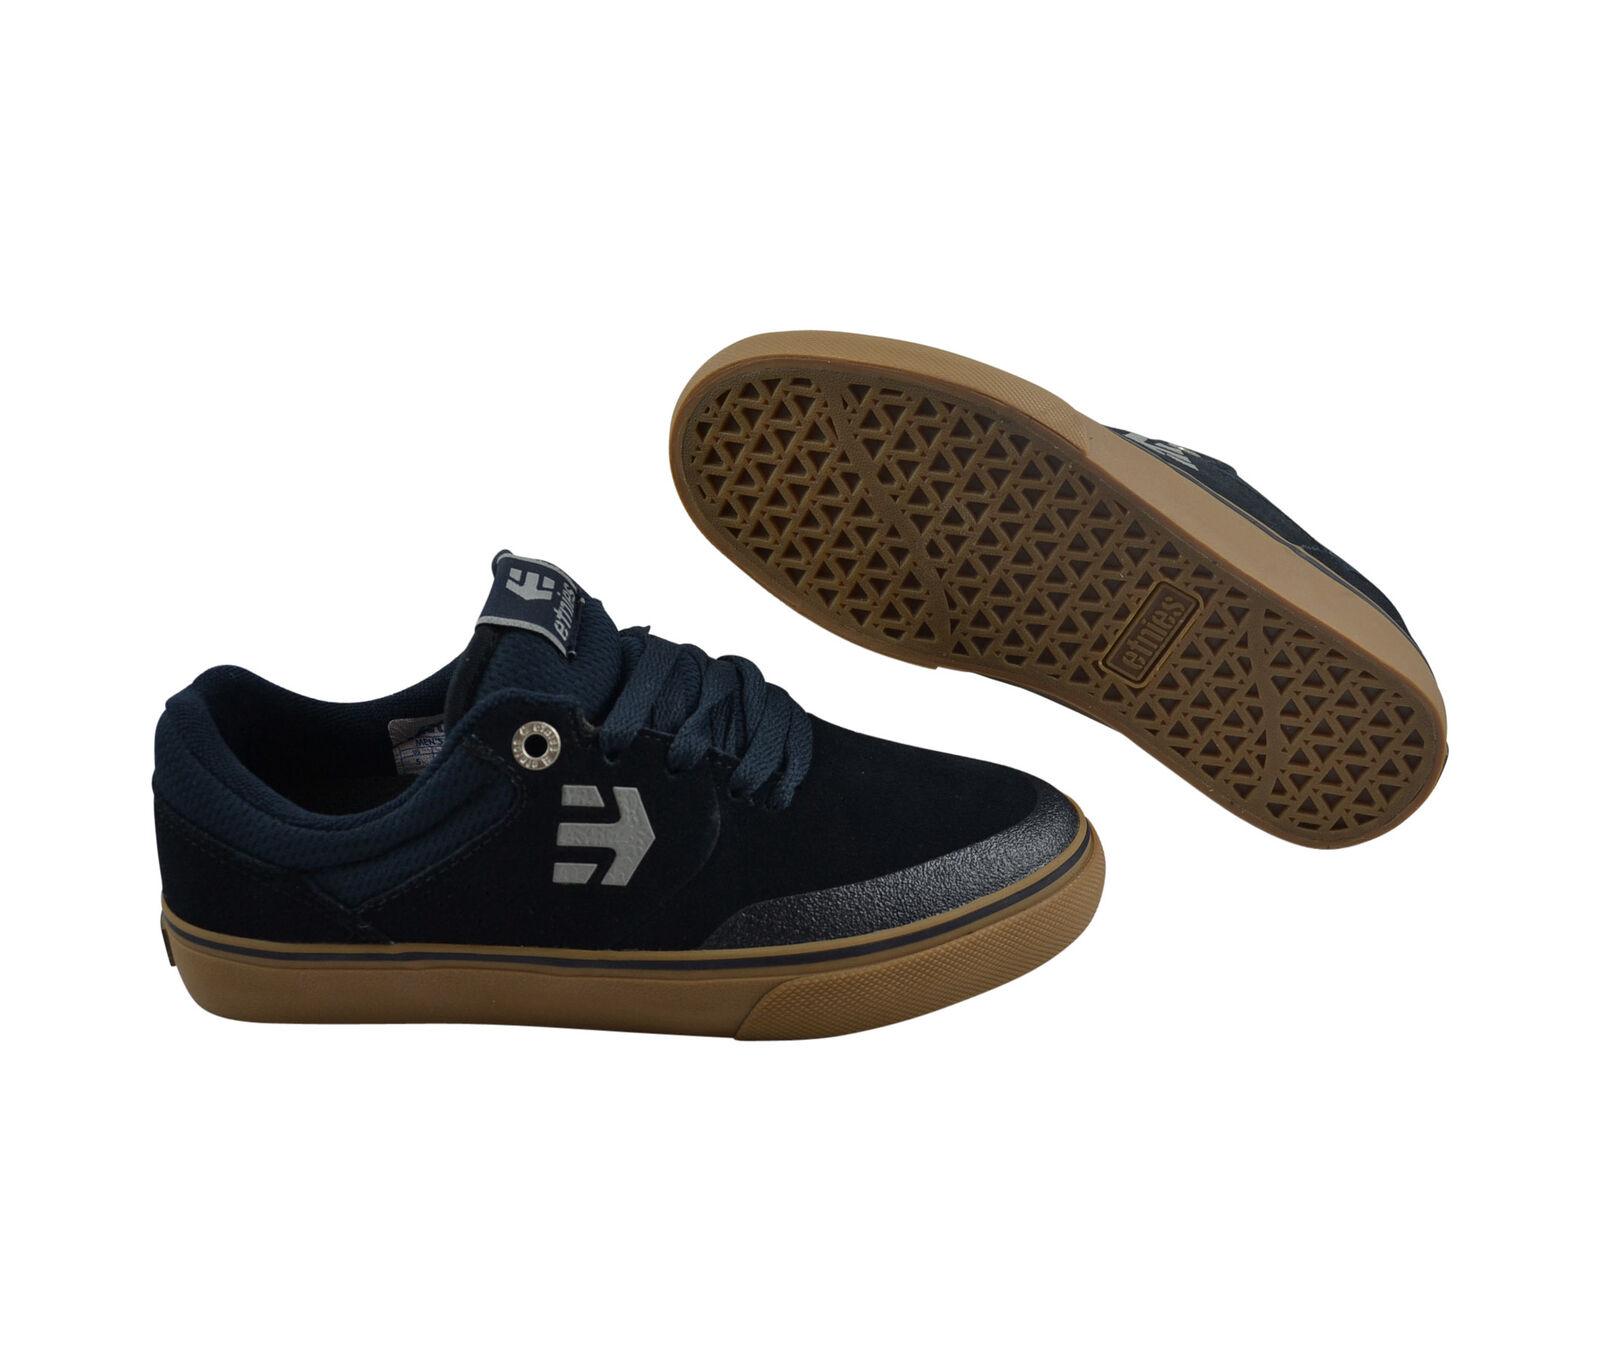 Etnies Marana Vulc navy gum Skater Turnschuhe Schuhe blau